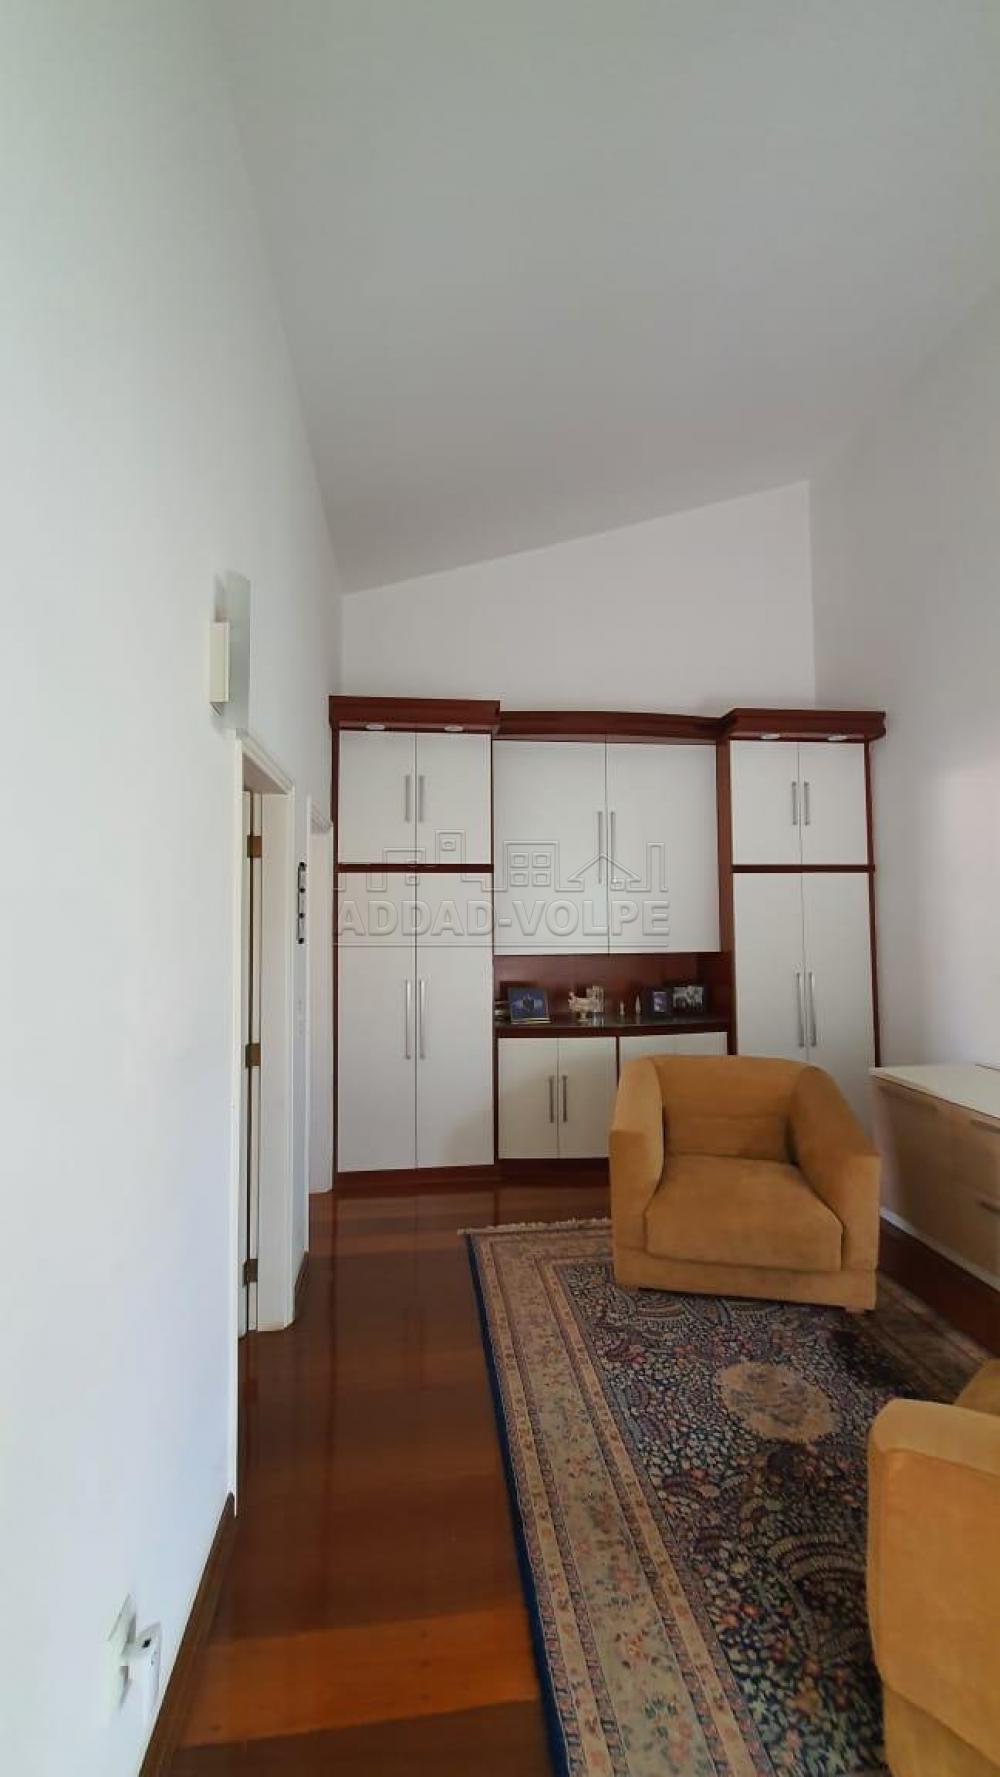 Comprar Casa / Condomínio em Bauru R$ 1.550.000,00 - Foto 16